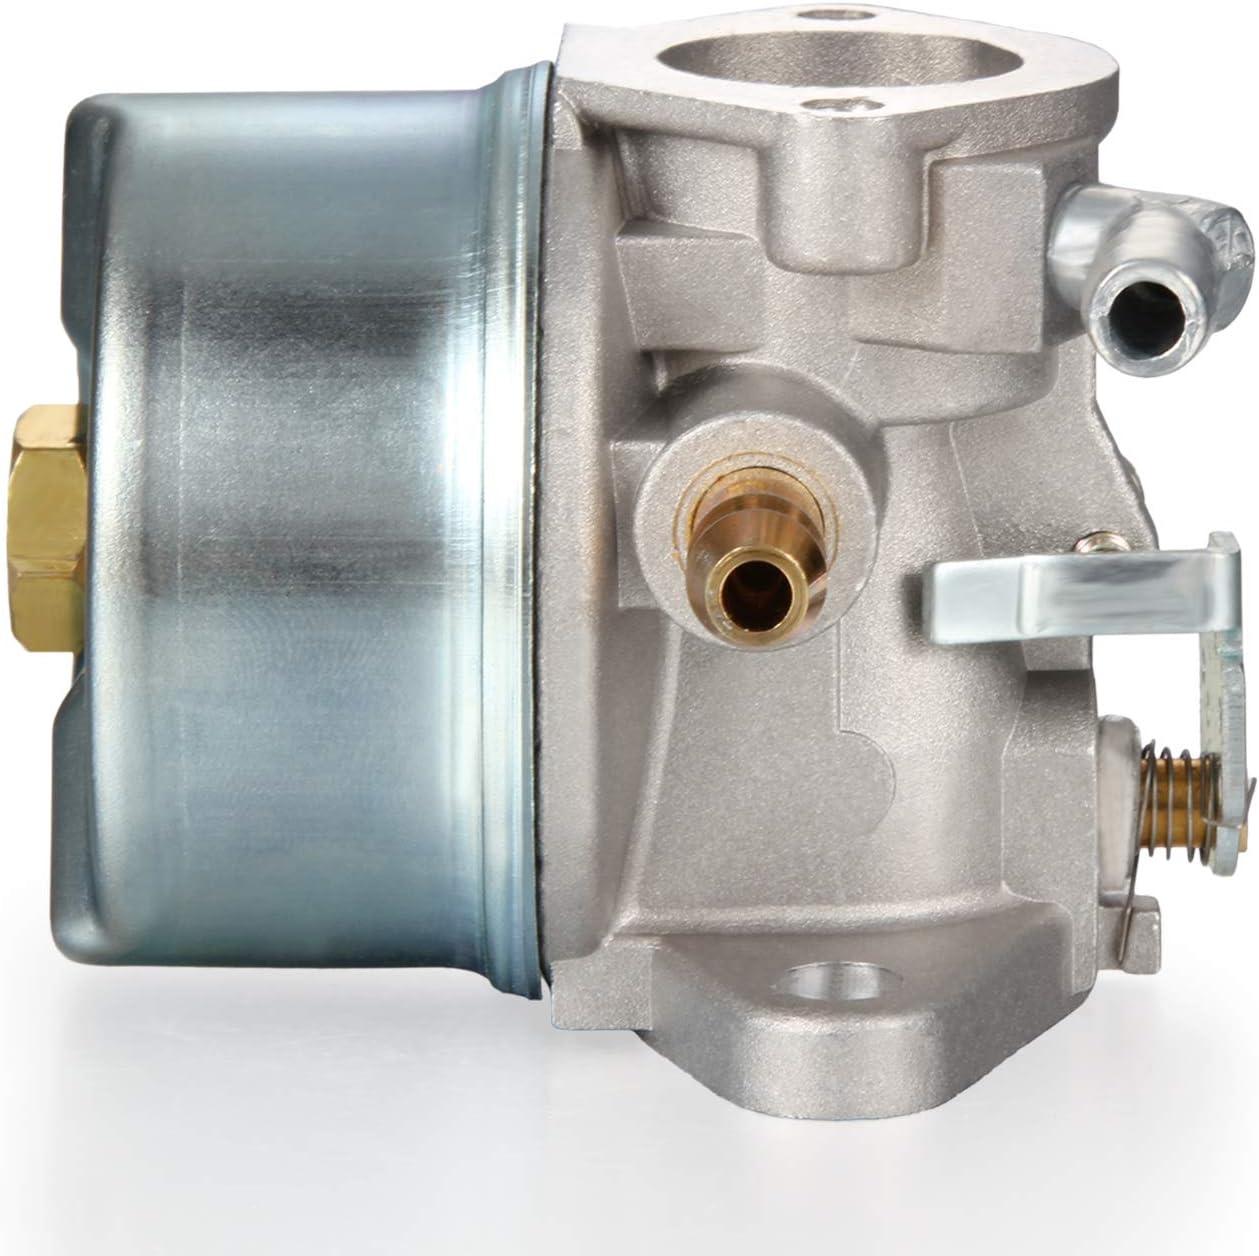 Dromedary 640025 Carburateur Tecumseh 193cc OHH55 OHH60 OHH65 ROT13152